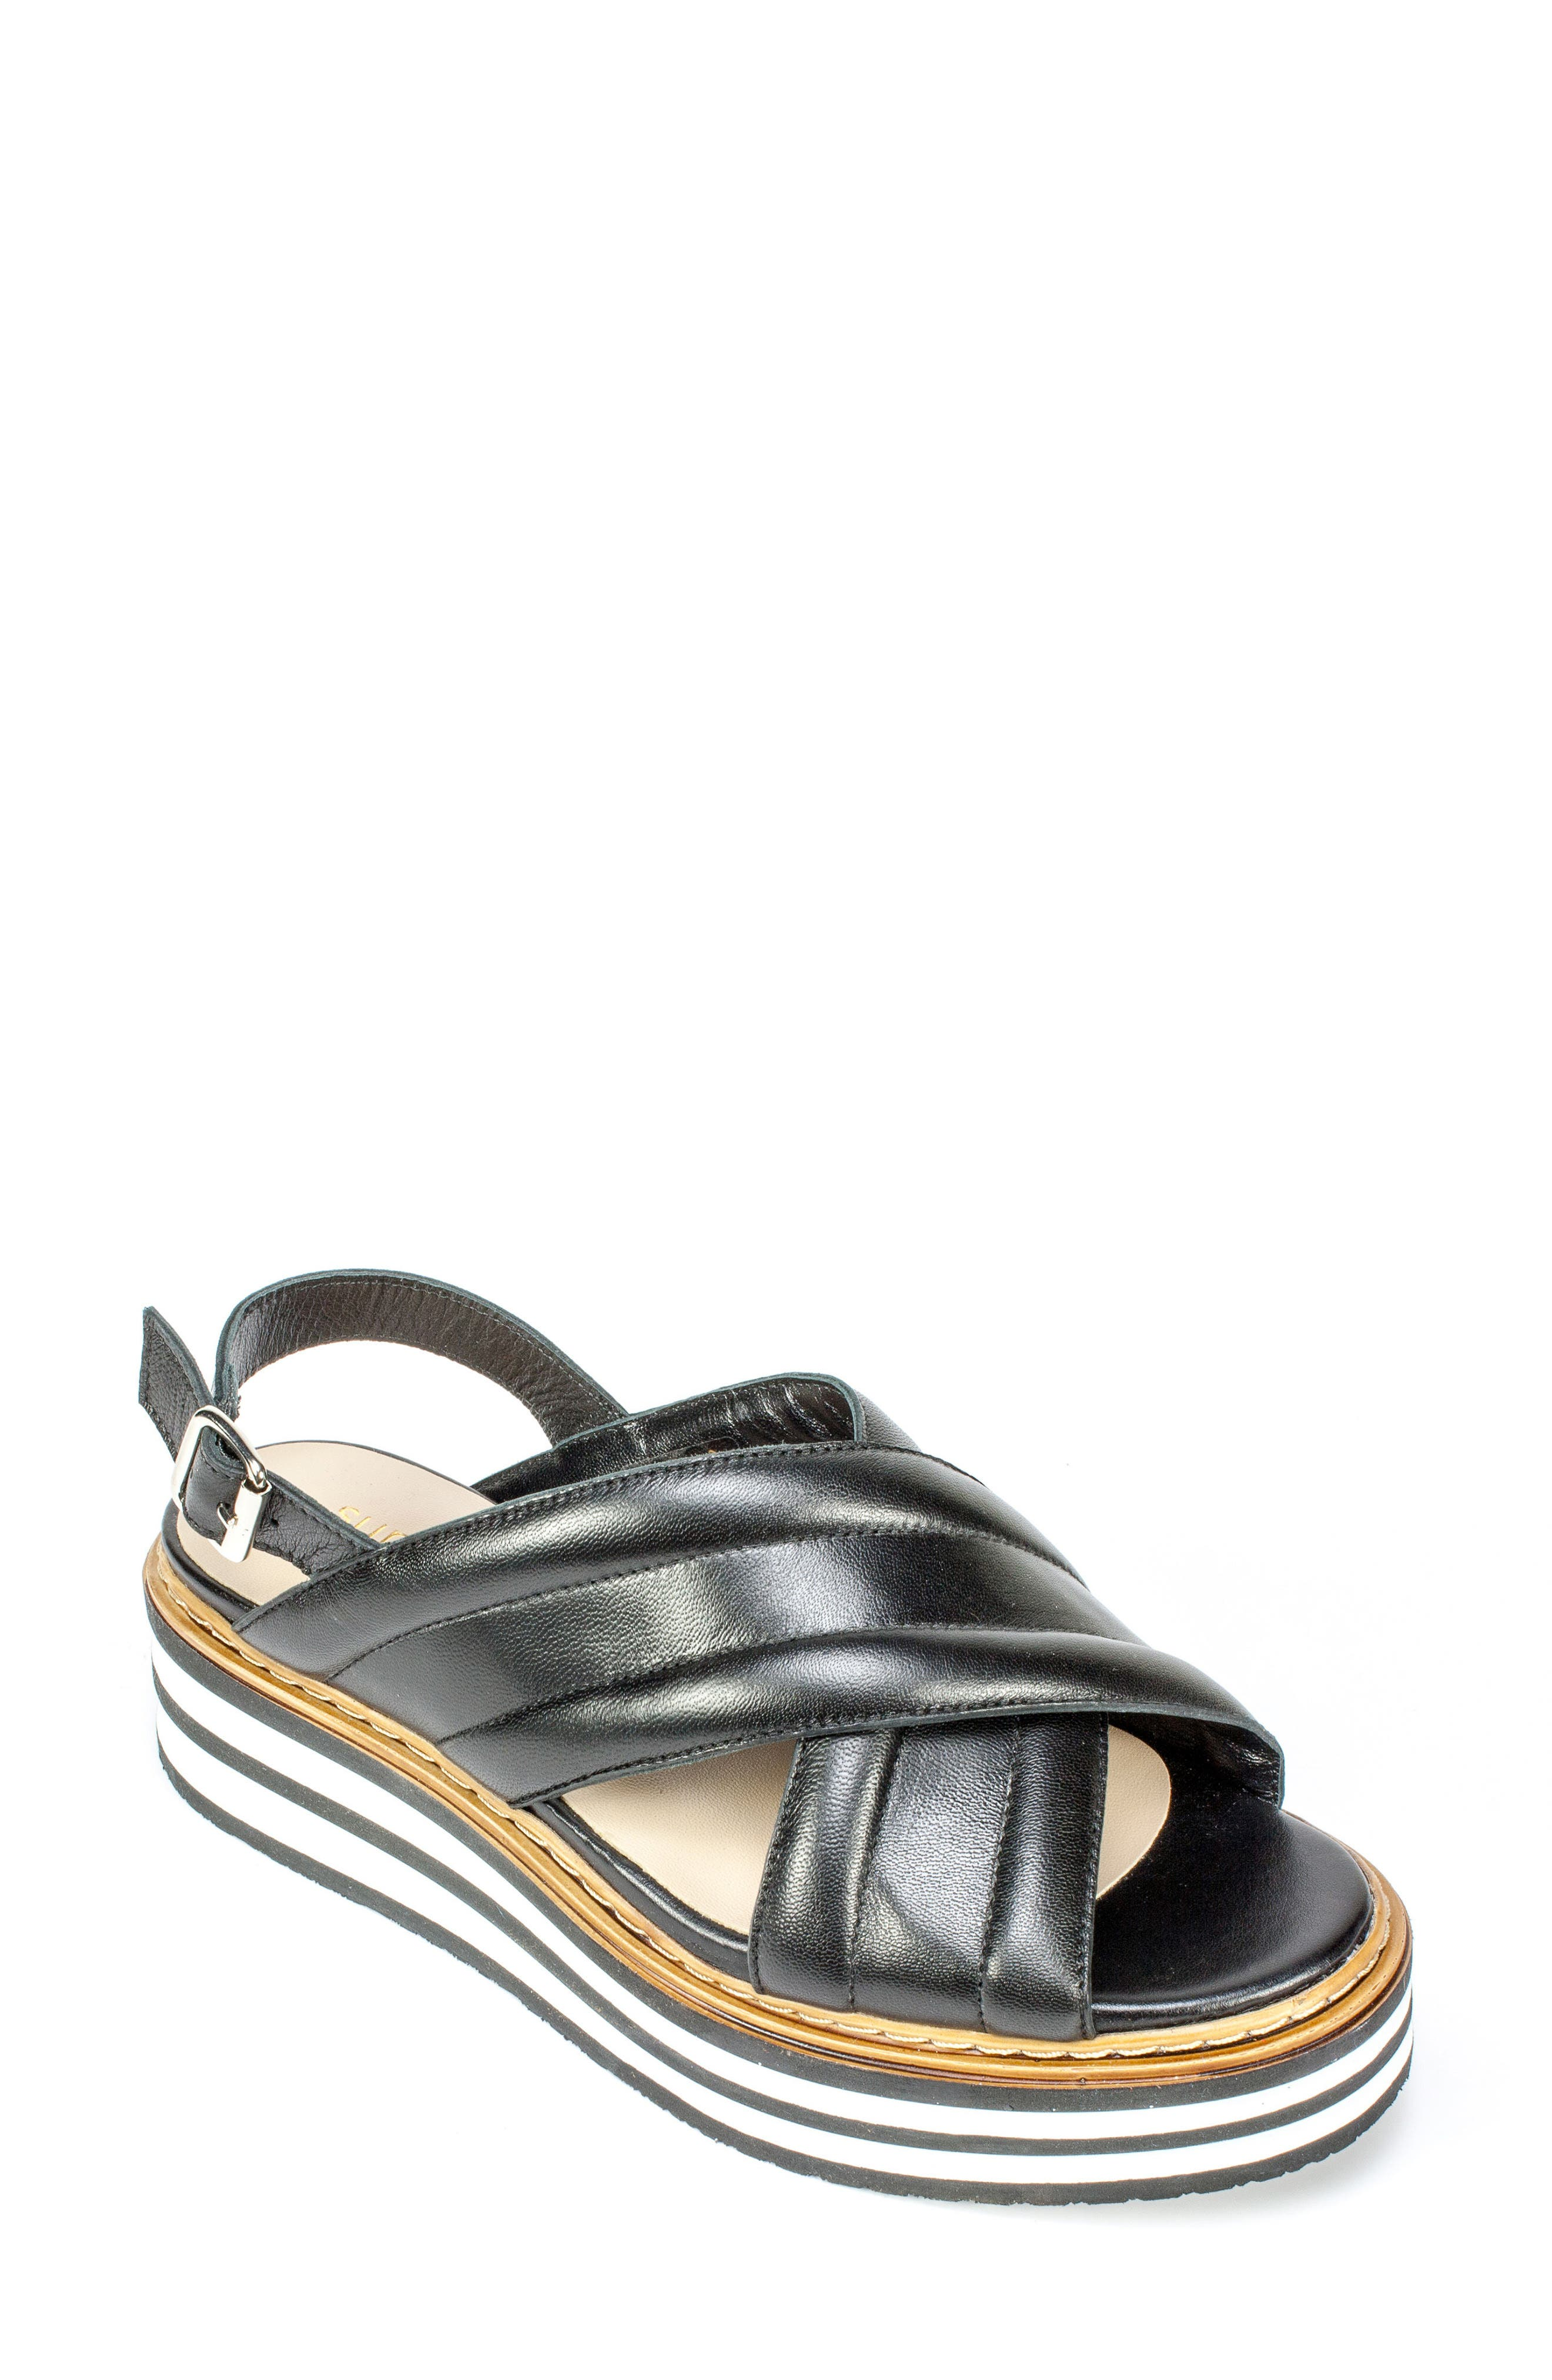 Summit Leanna Platform Sandal,                             Main thumbnail 1, color,                             001